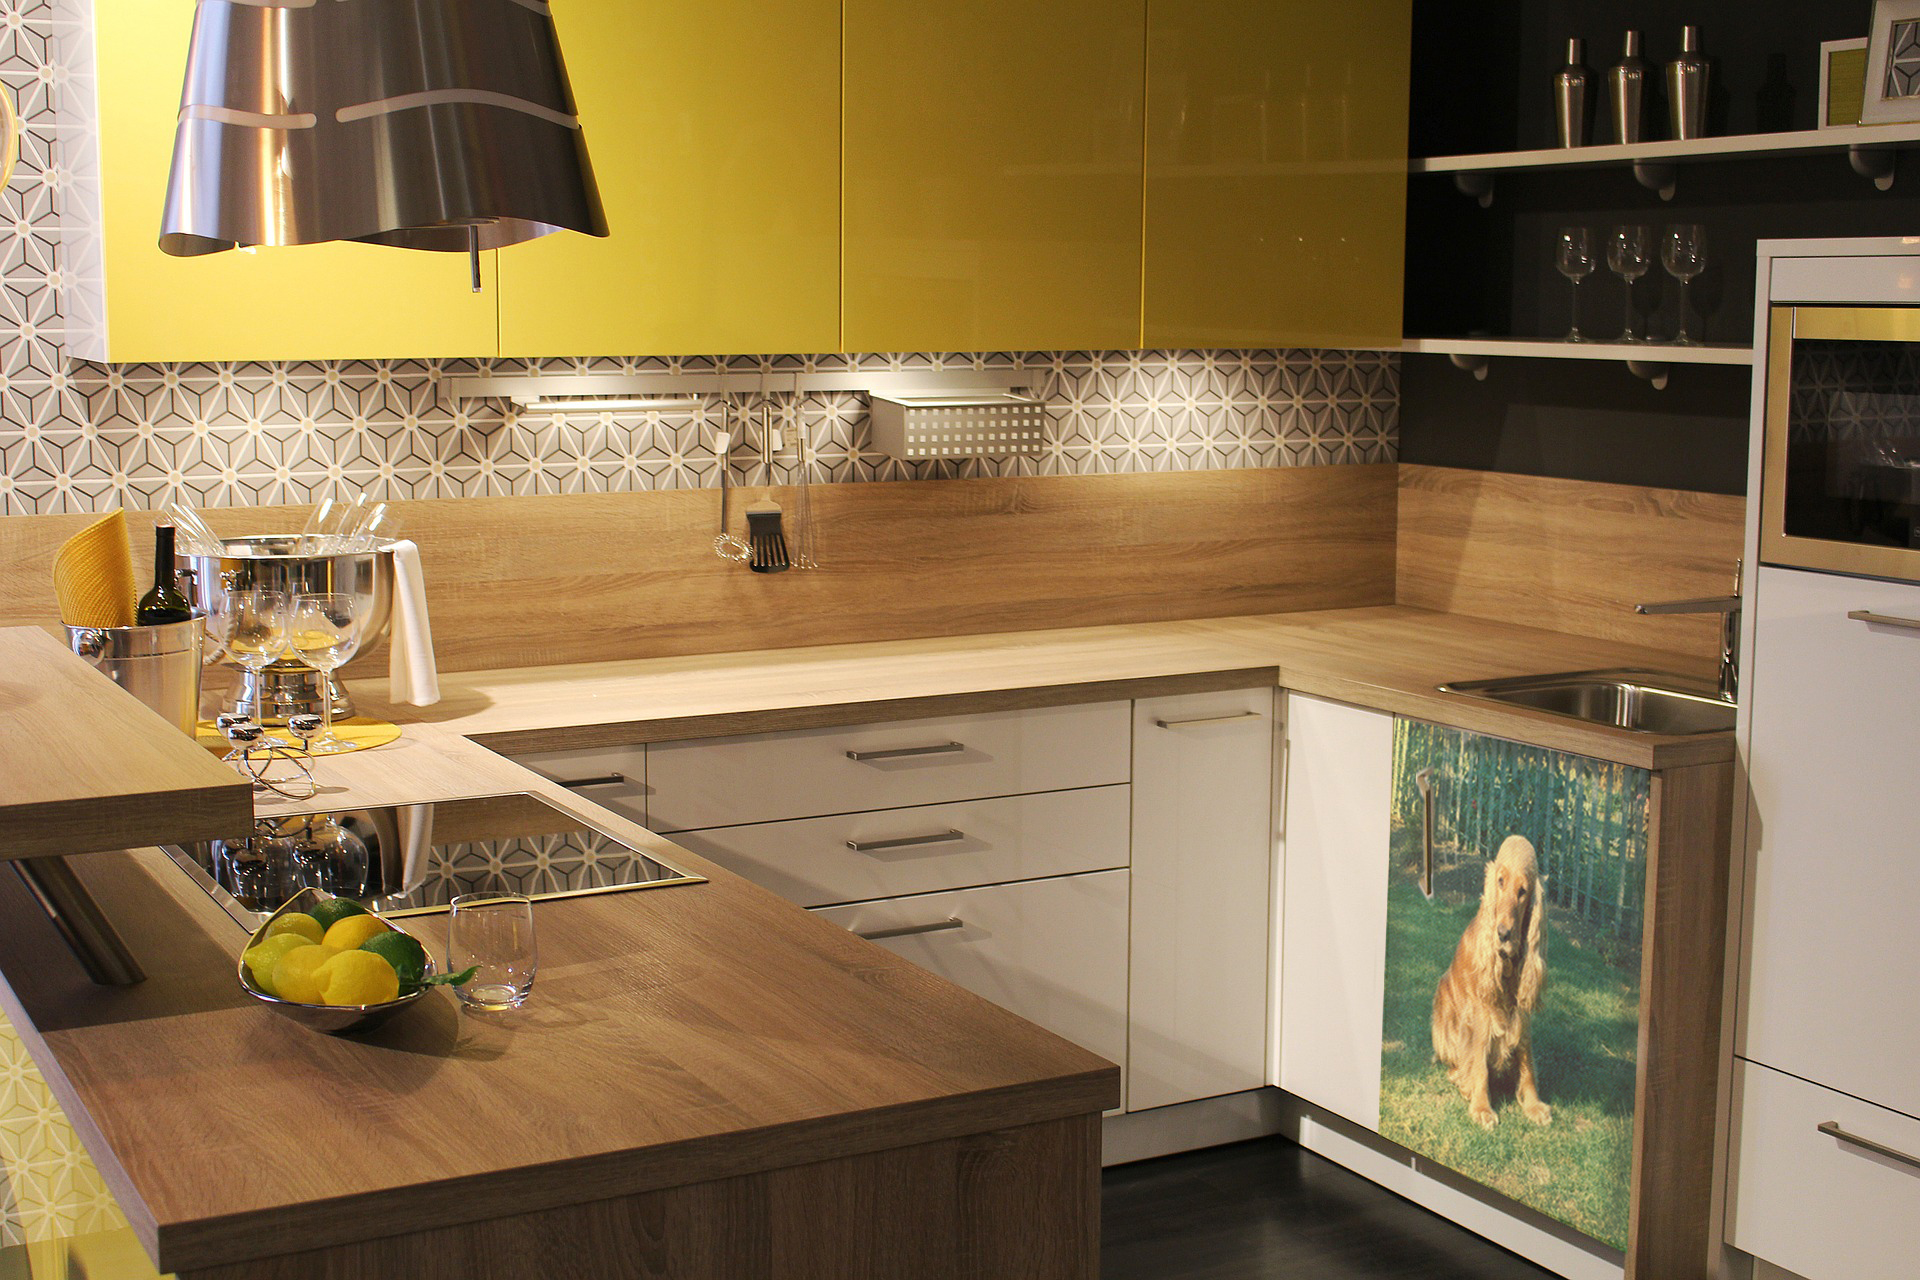 spaniel_kitchen-